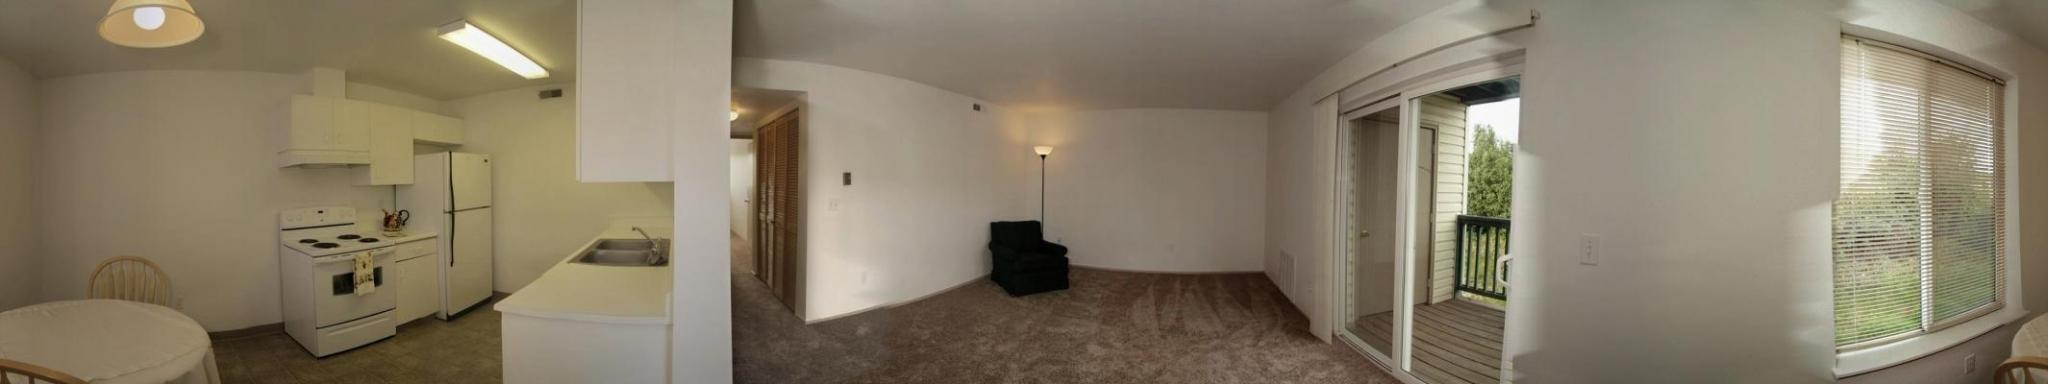 Apartment Tour 3